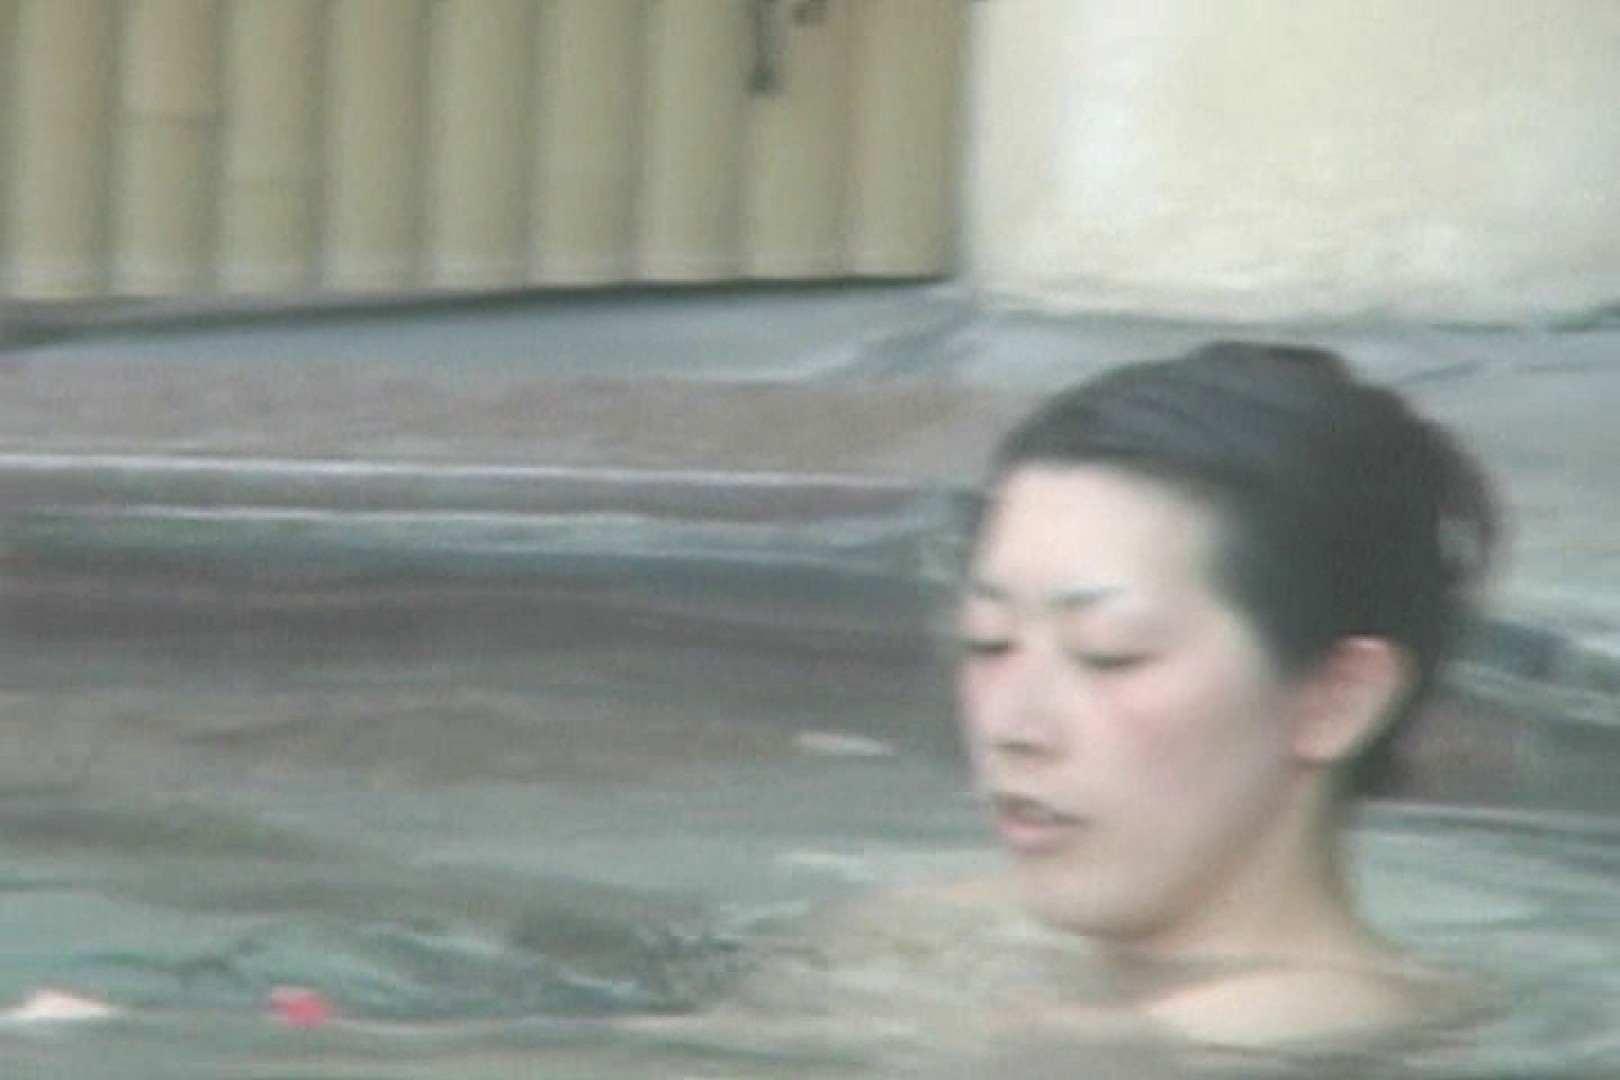 Aquaな露天風呂Vol.589 盗撮シリーズ | 露天風呂編  113PIX 5